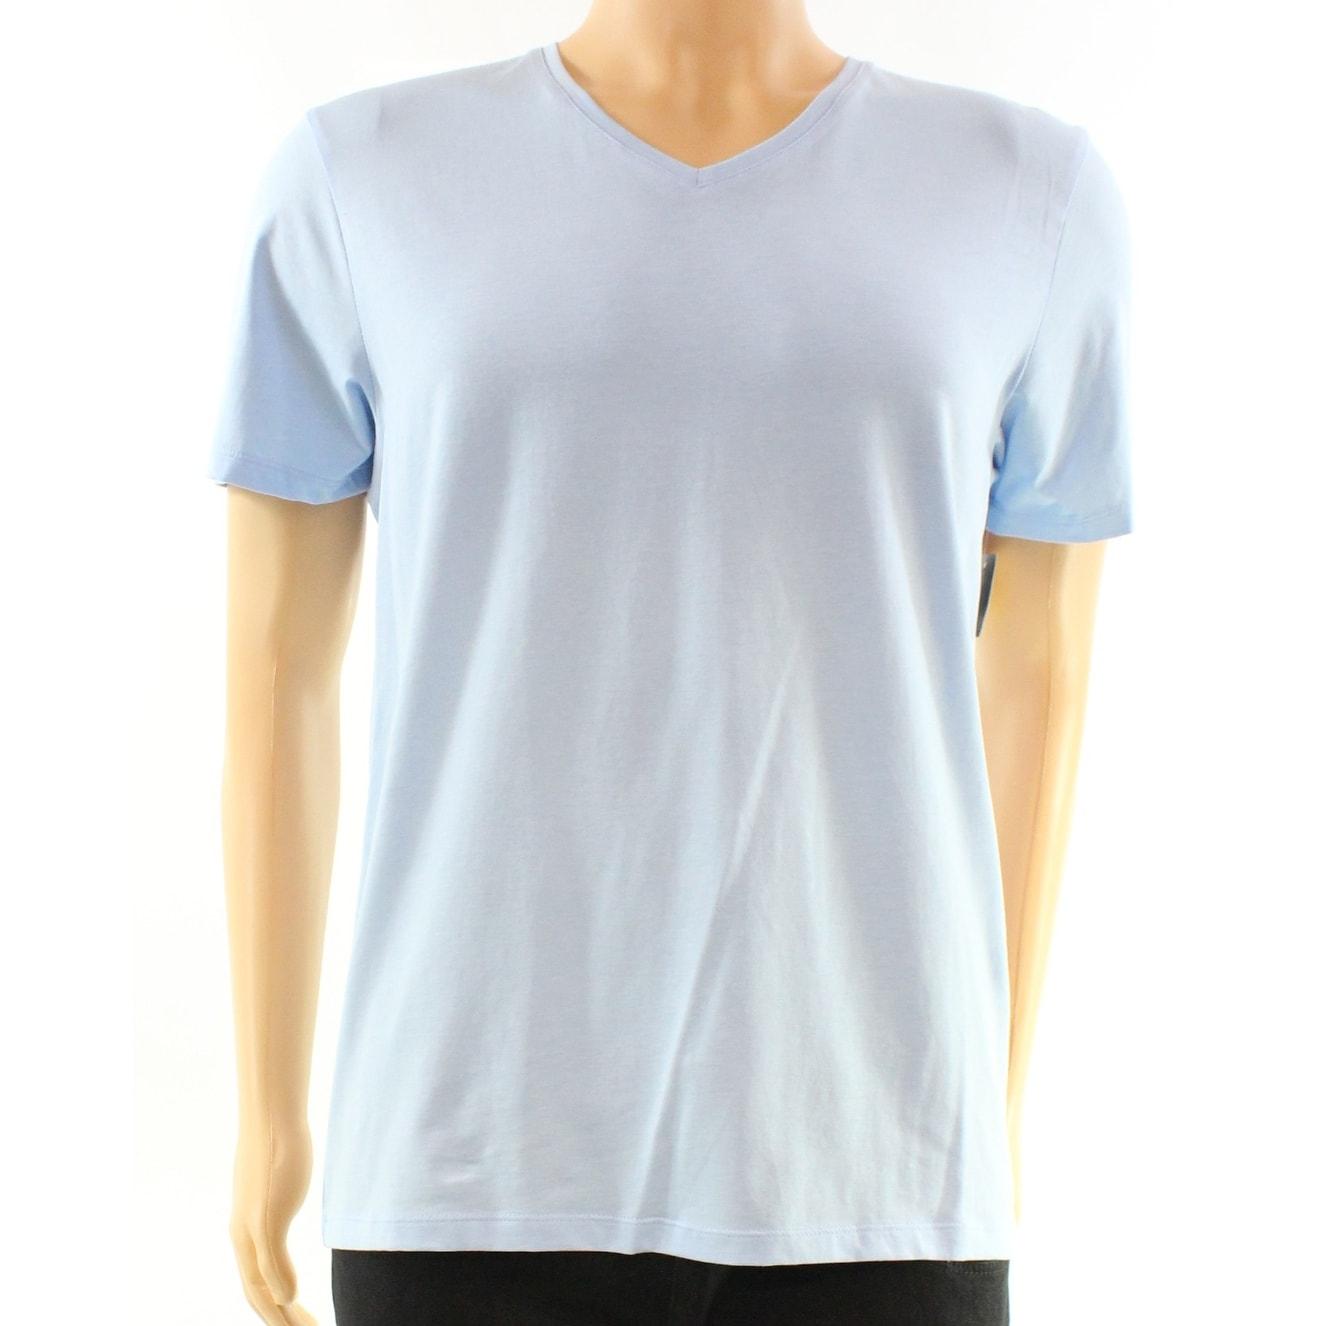 a3953681dcc1 ... Shop INC NEW Light Blue Clear Sky Mens Size Large L V Neck Knit Tee